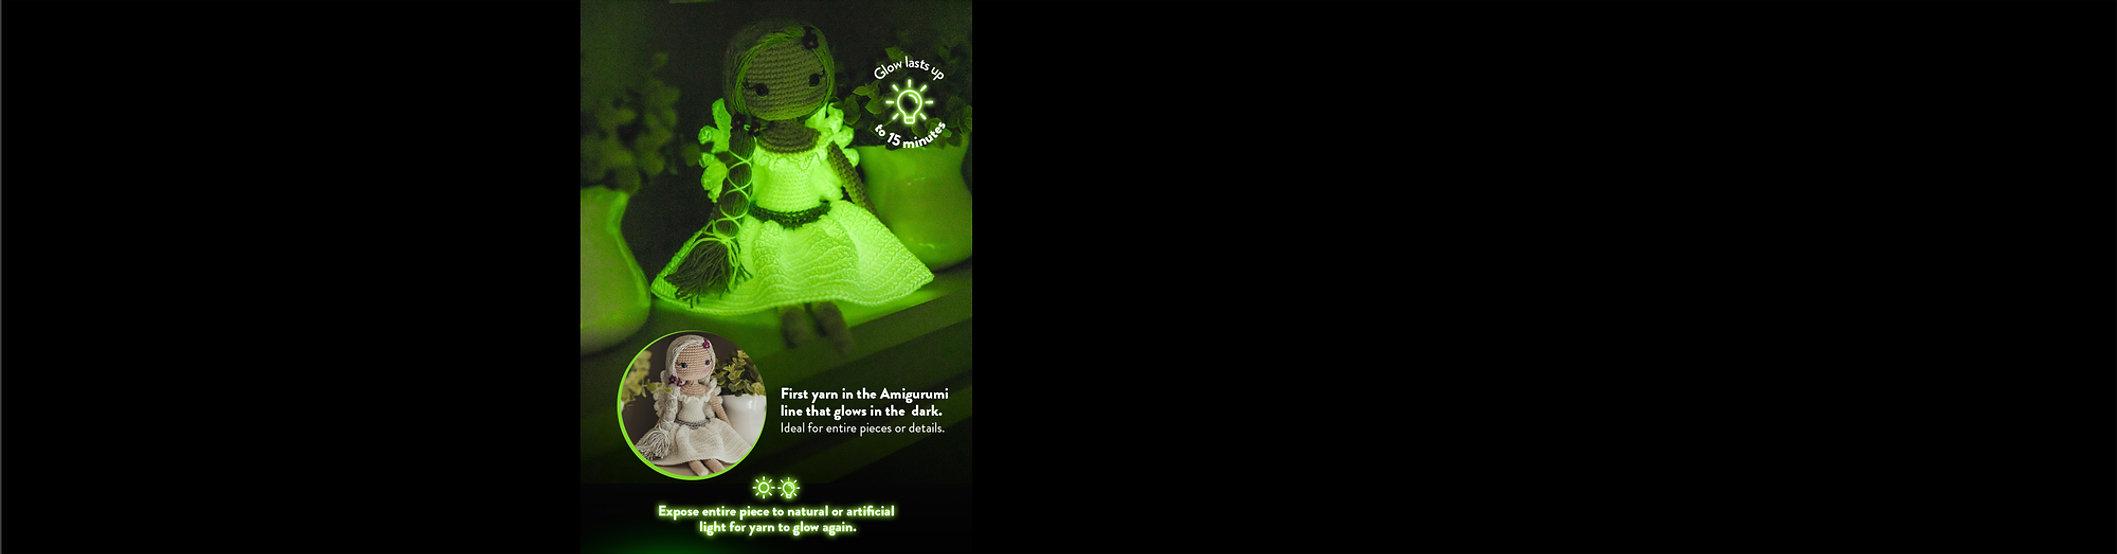 capa_amigurumi_glow.jpg